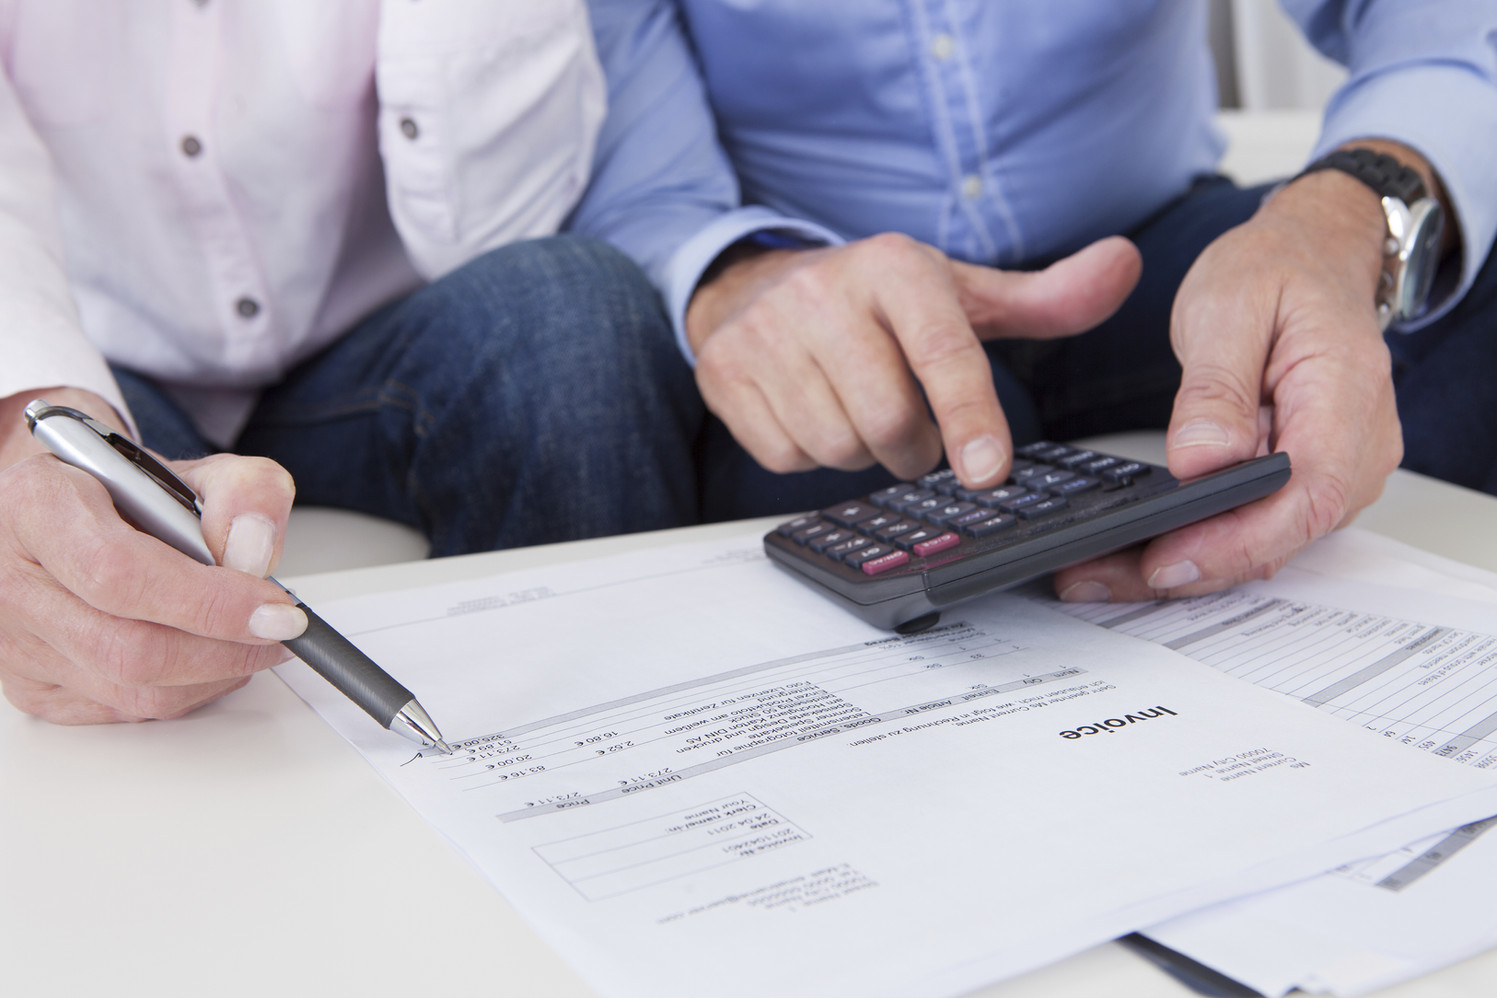 Accountancy firms